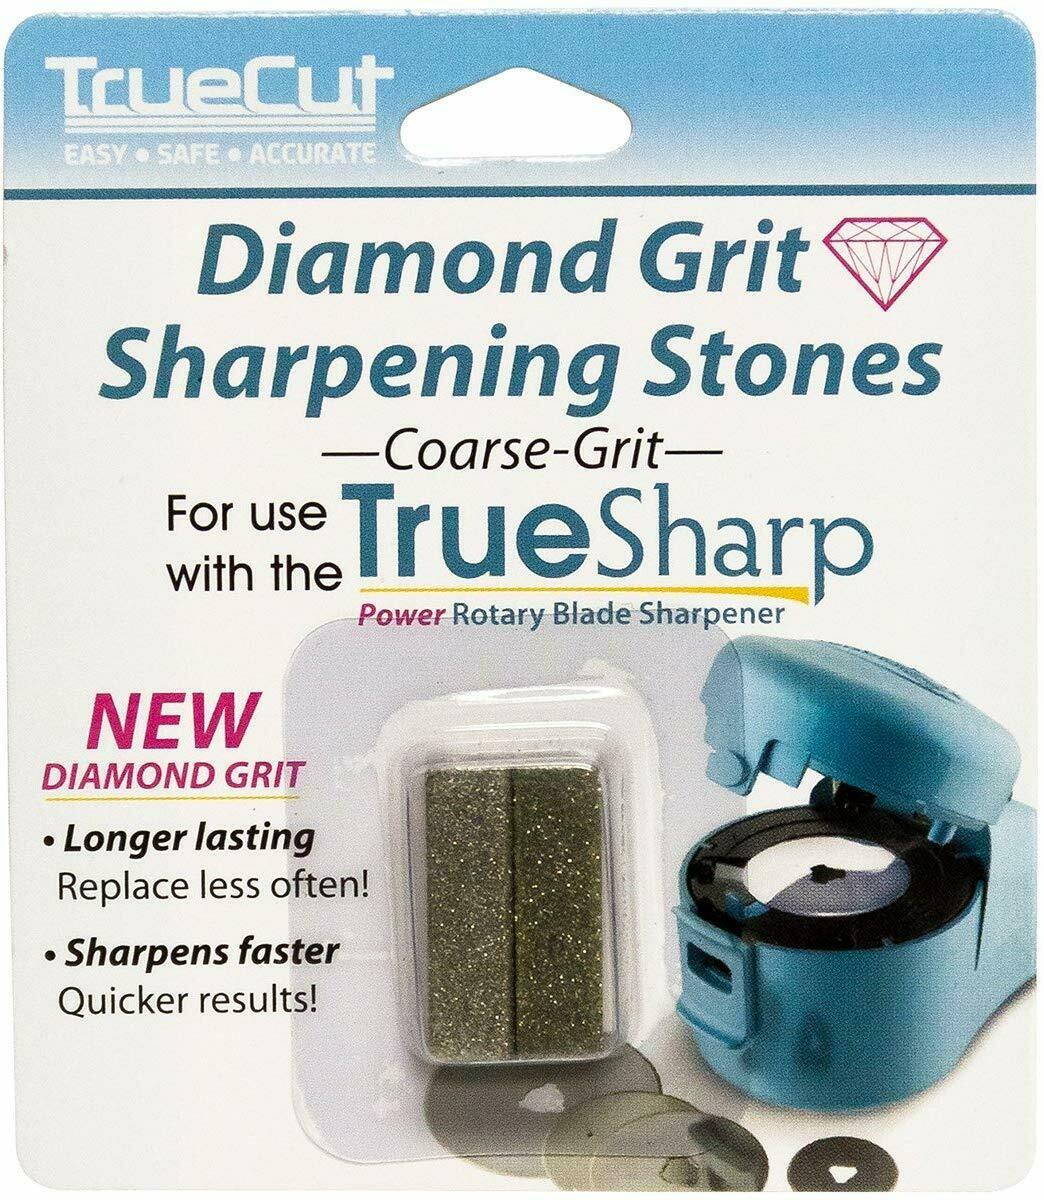 DIAMOND GRIT SHARPENING STONES   True Cut